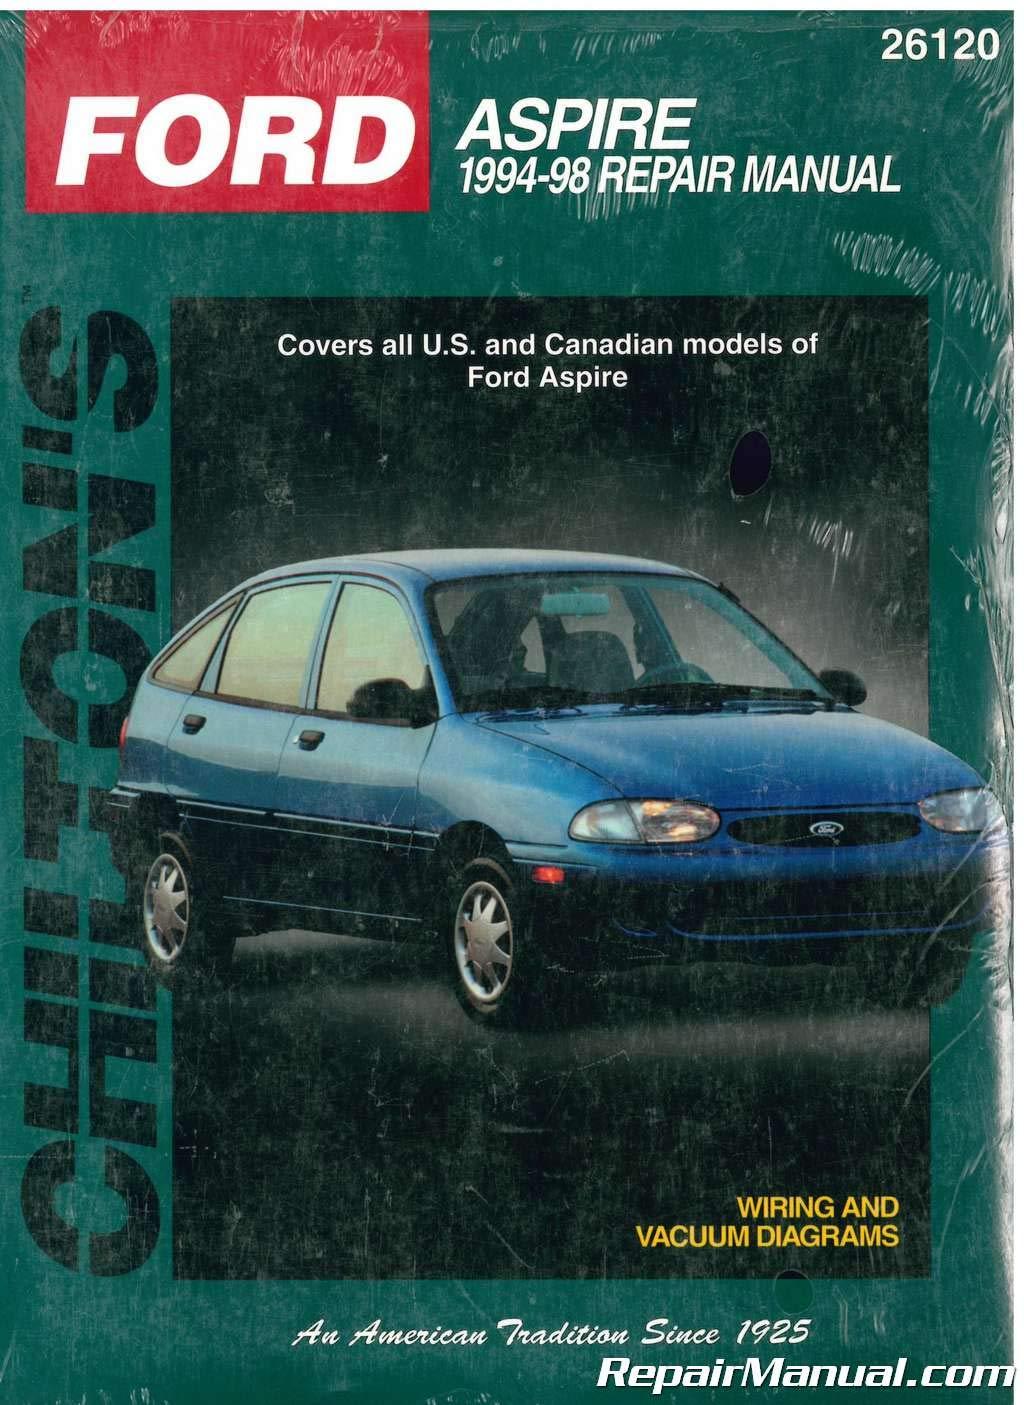 1994 ford aspire wiring diagram ch26120 chilton ford aspire 1994 1998 repair manual by publisher  ch26120 chilton ford aspire 1994 1998